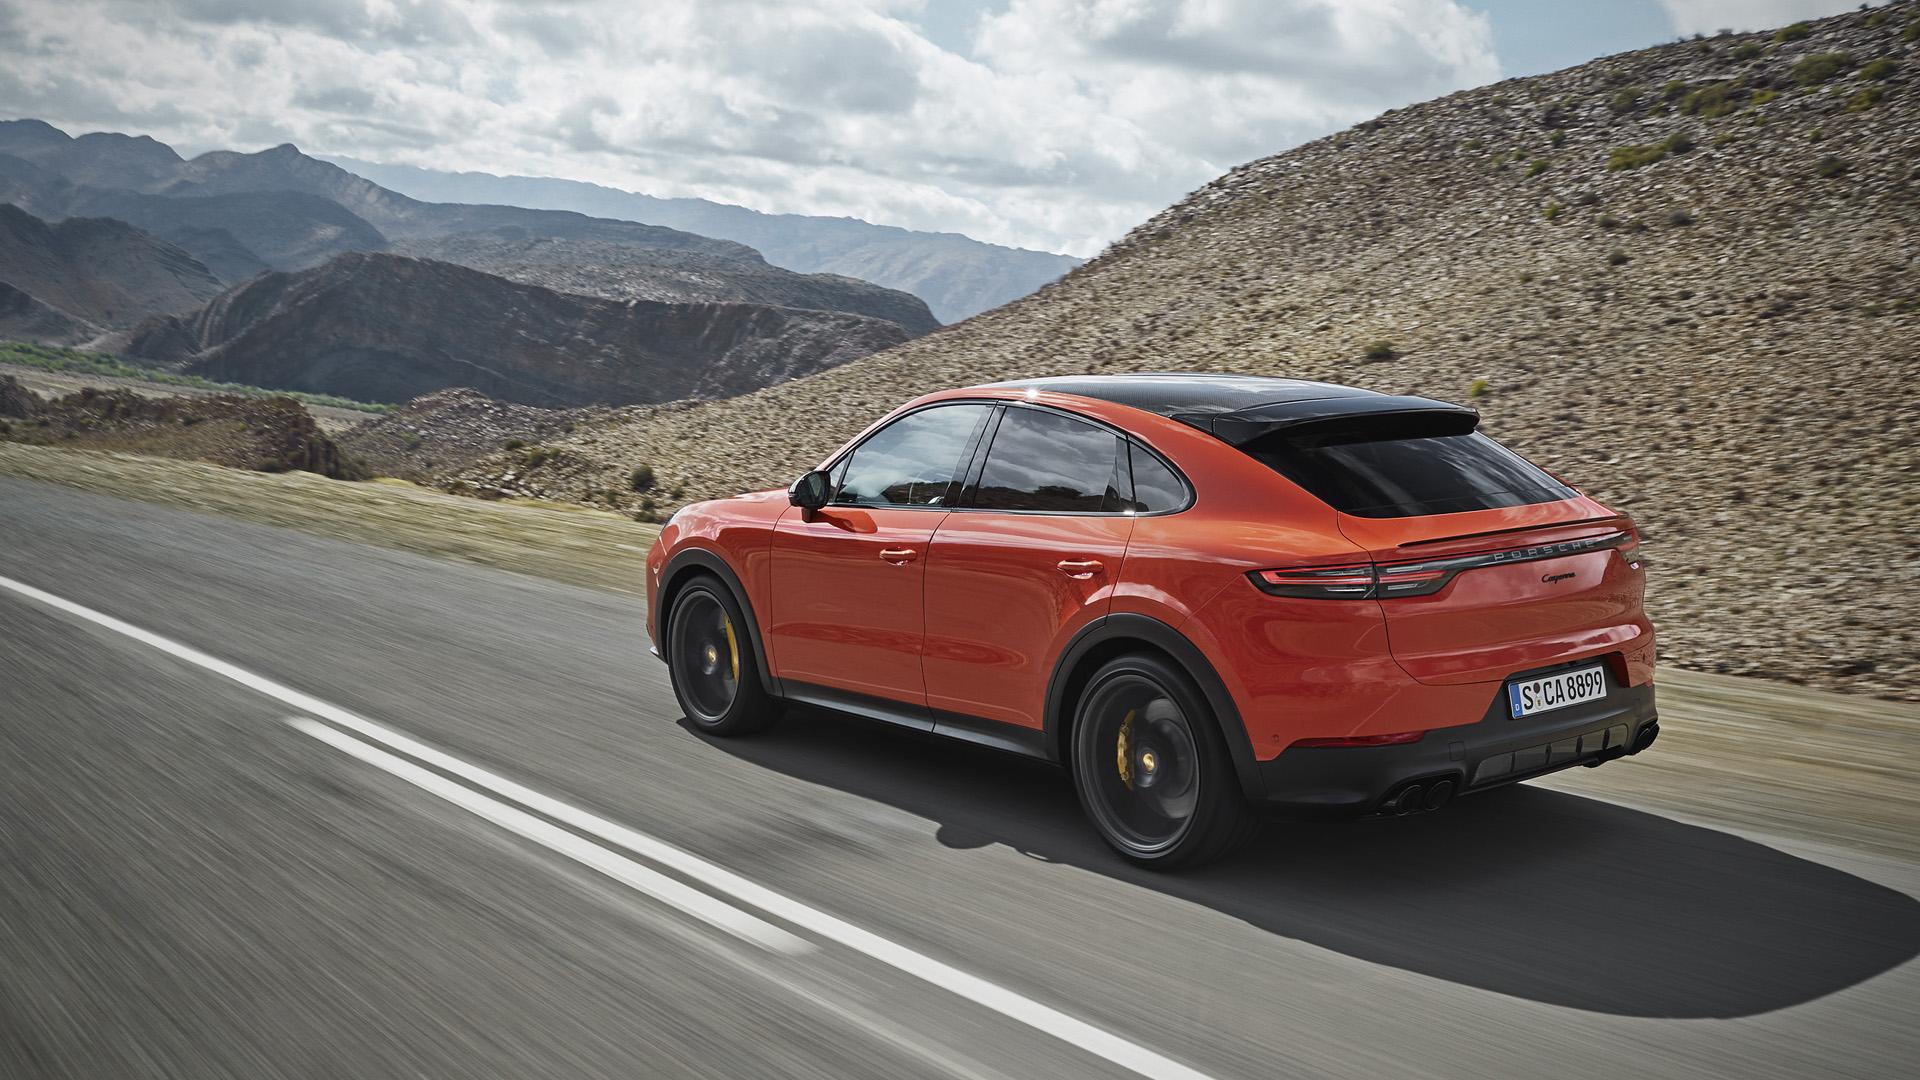 2020 Porsche Cayenne Coupe Second Drive Cargo Space Performance Fuel Economy Autoblog